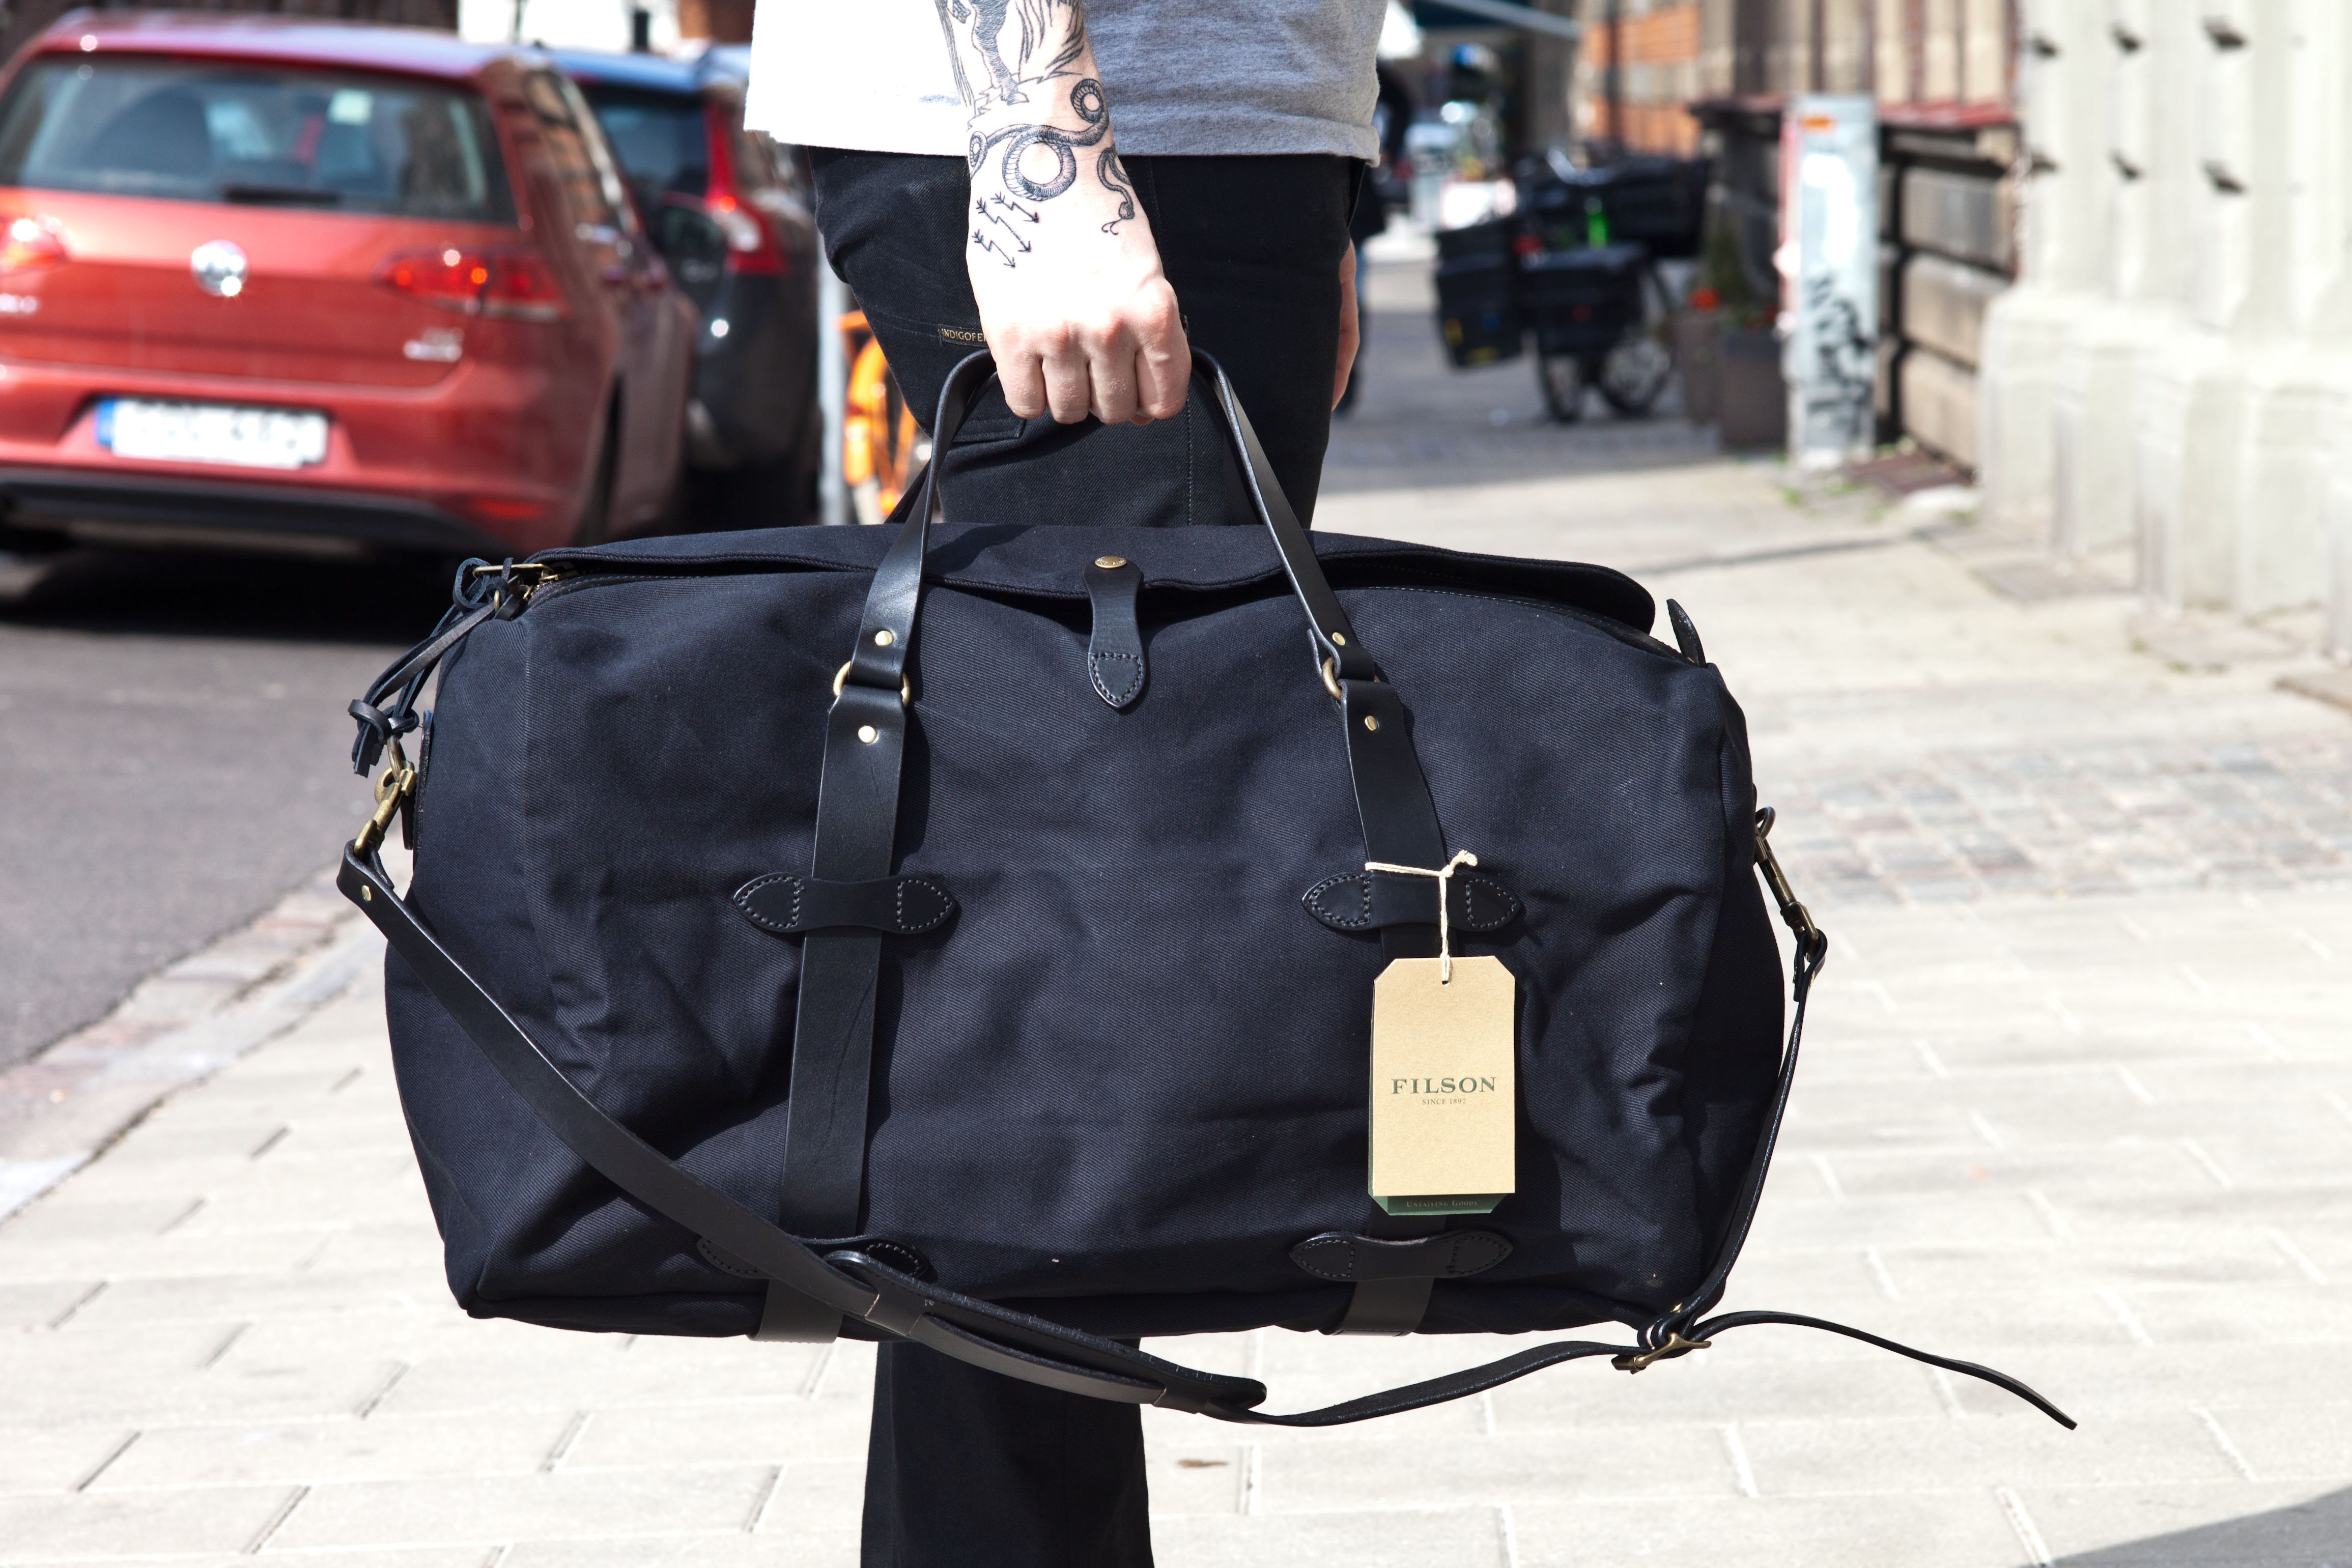 Filson Medium Duffle Bag Black 1 2